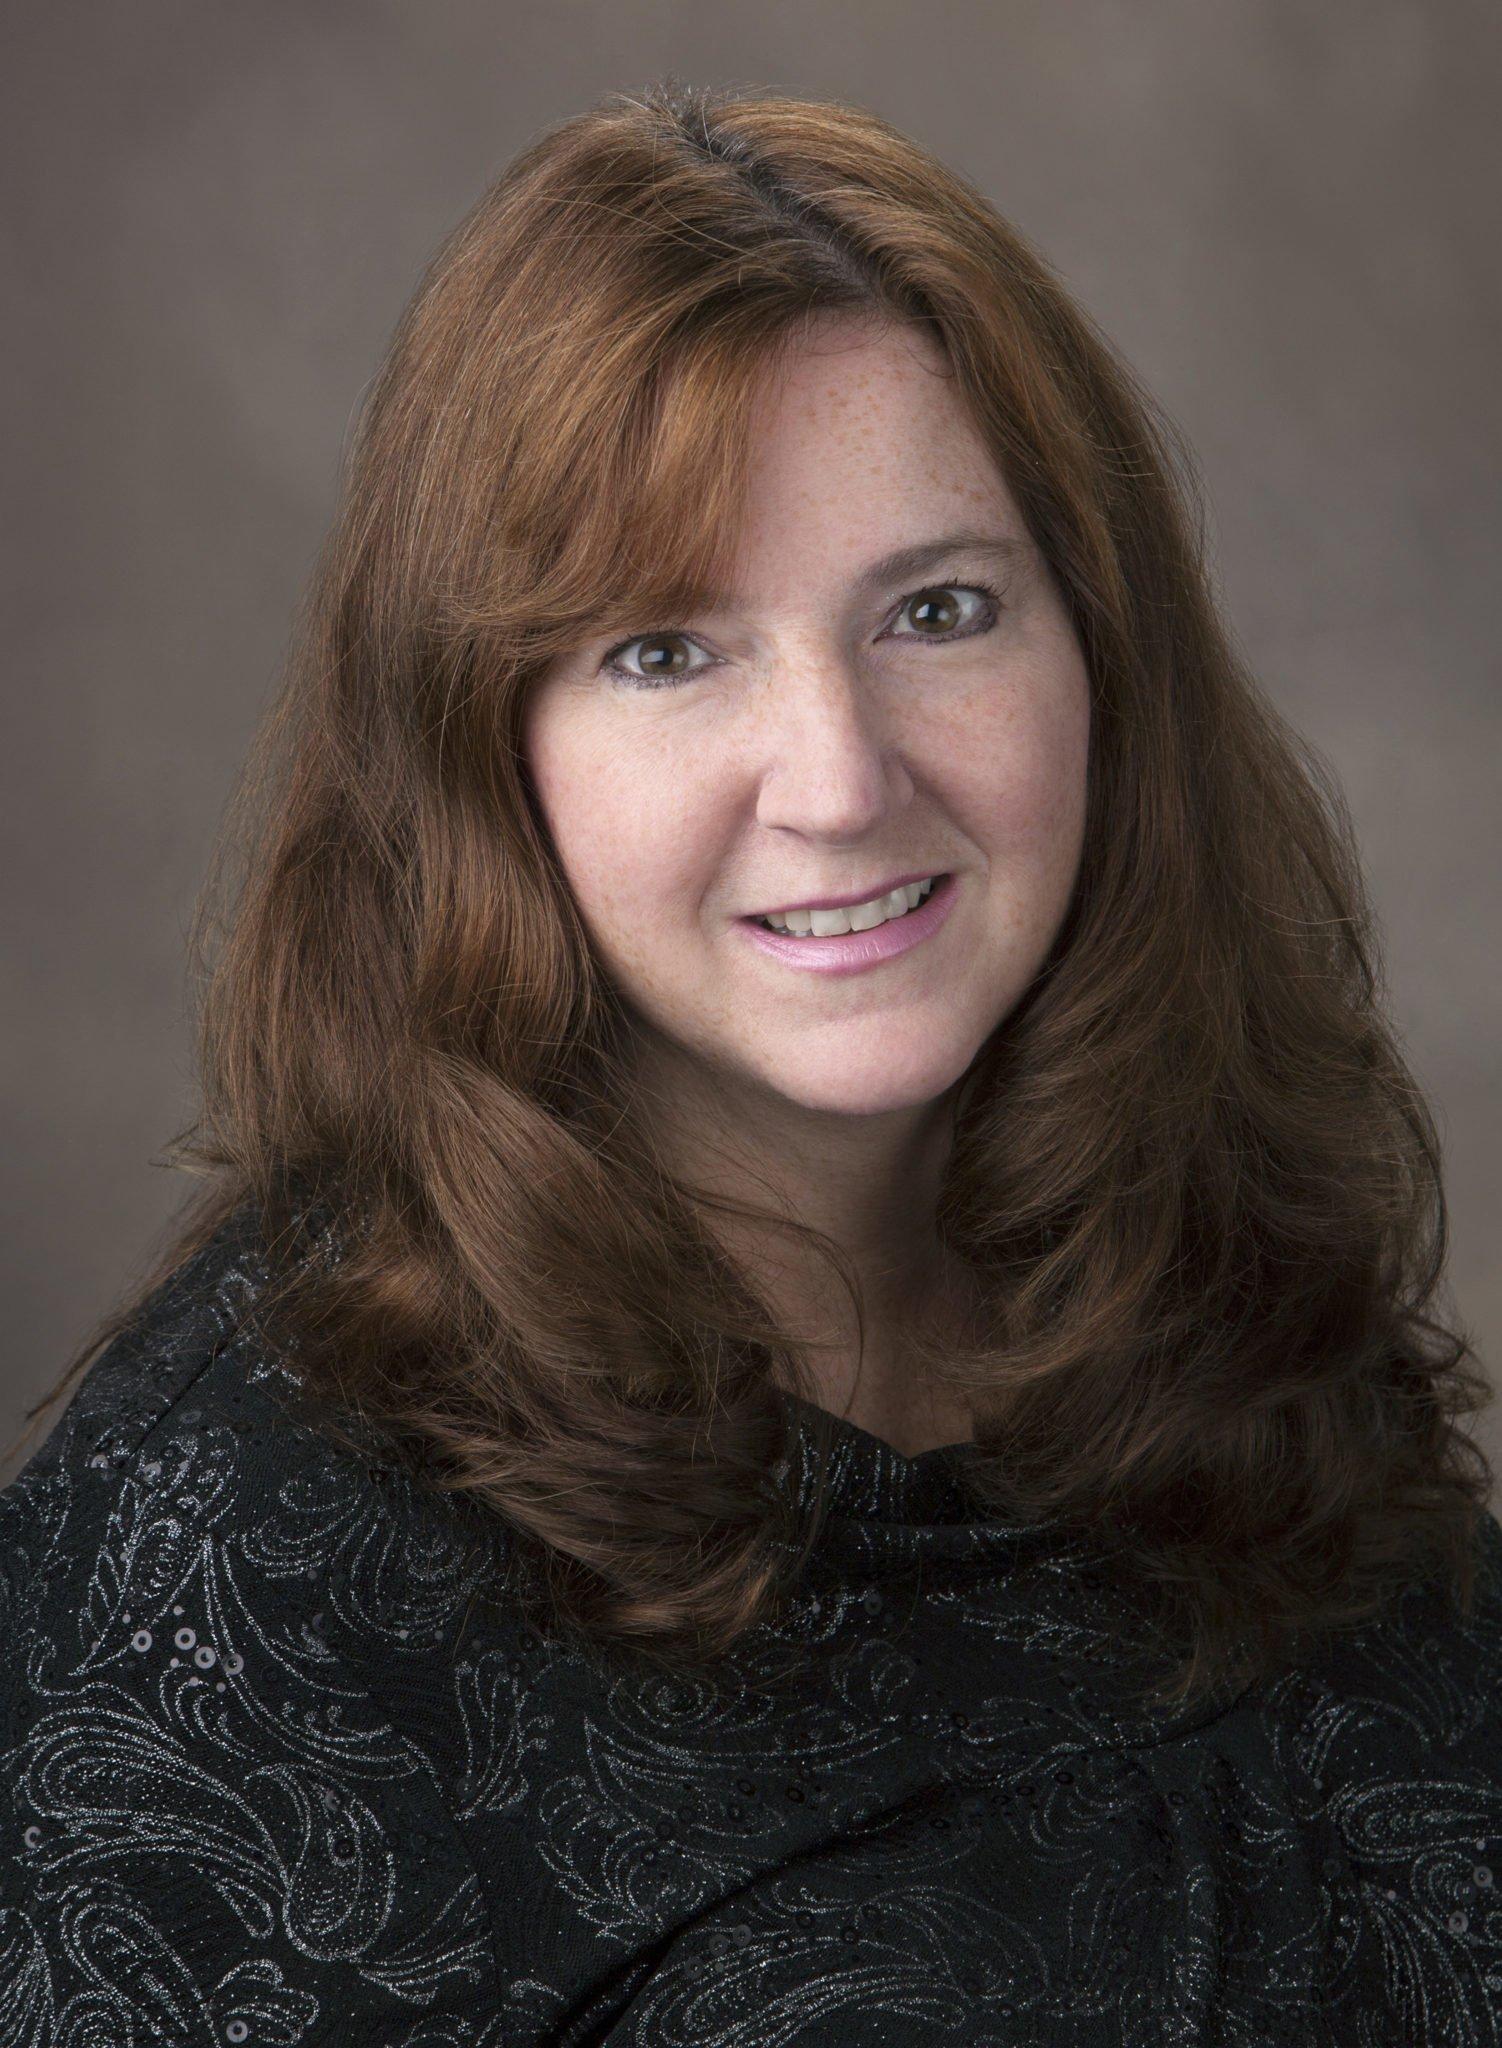 Kathleen Modolo